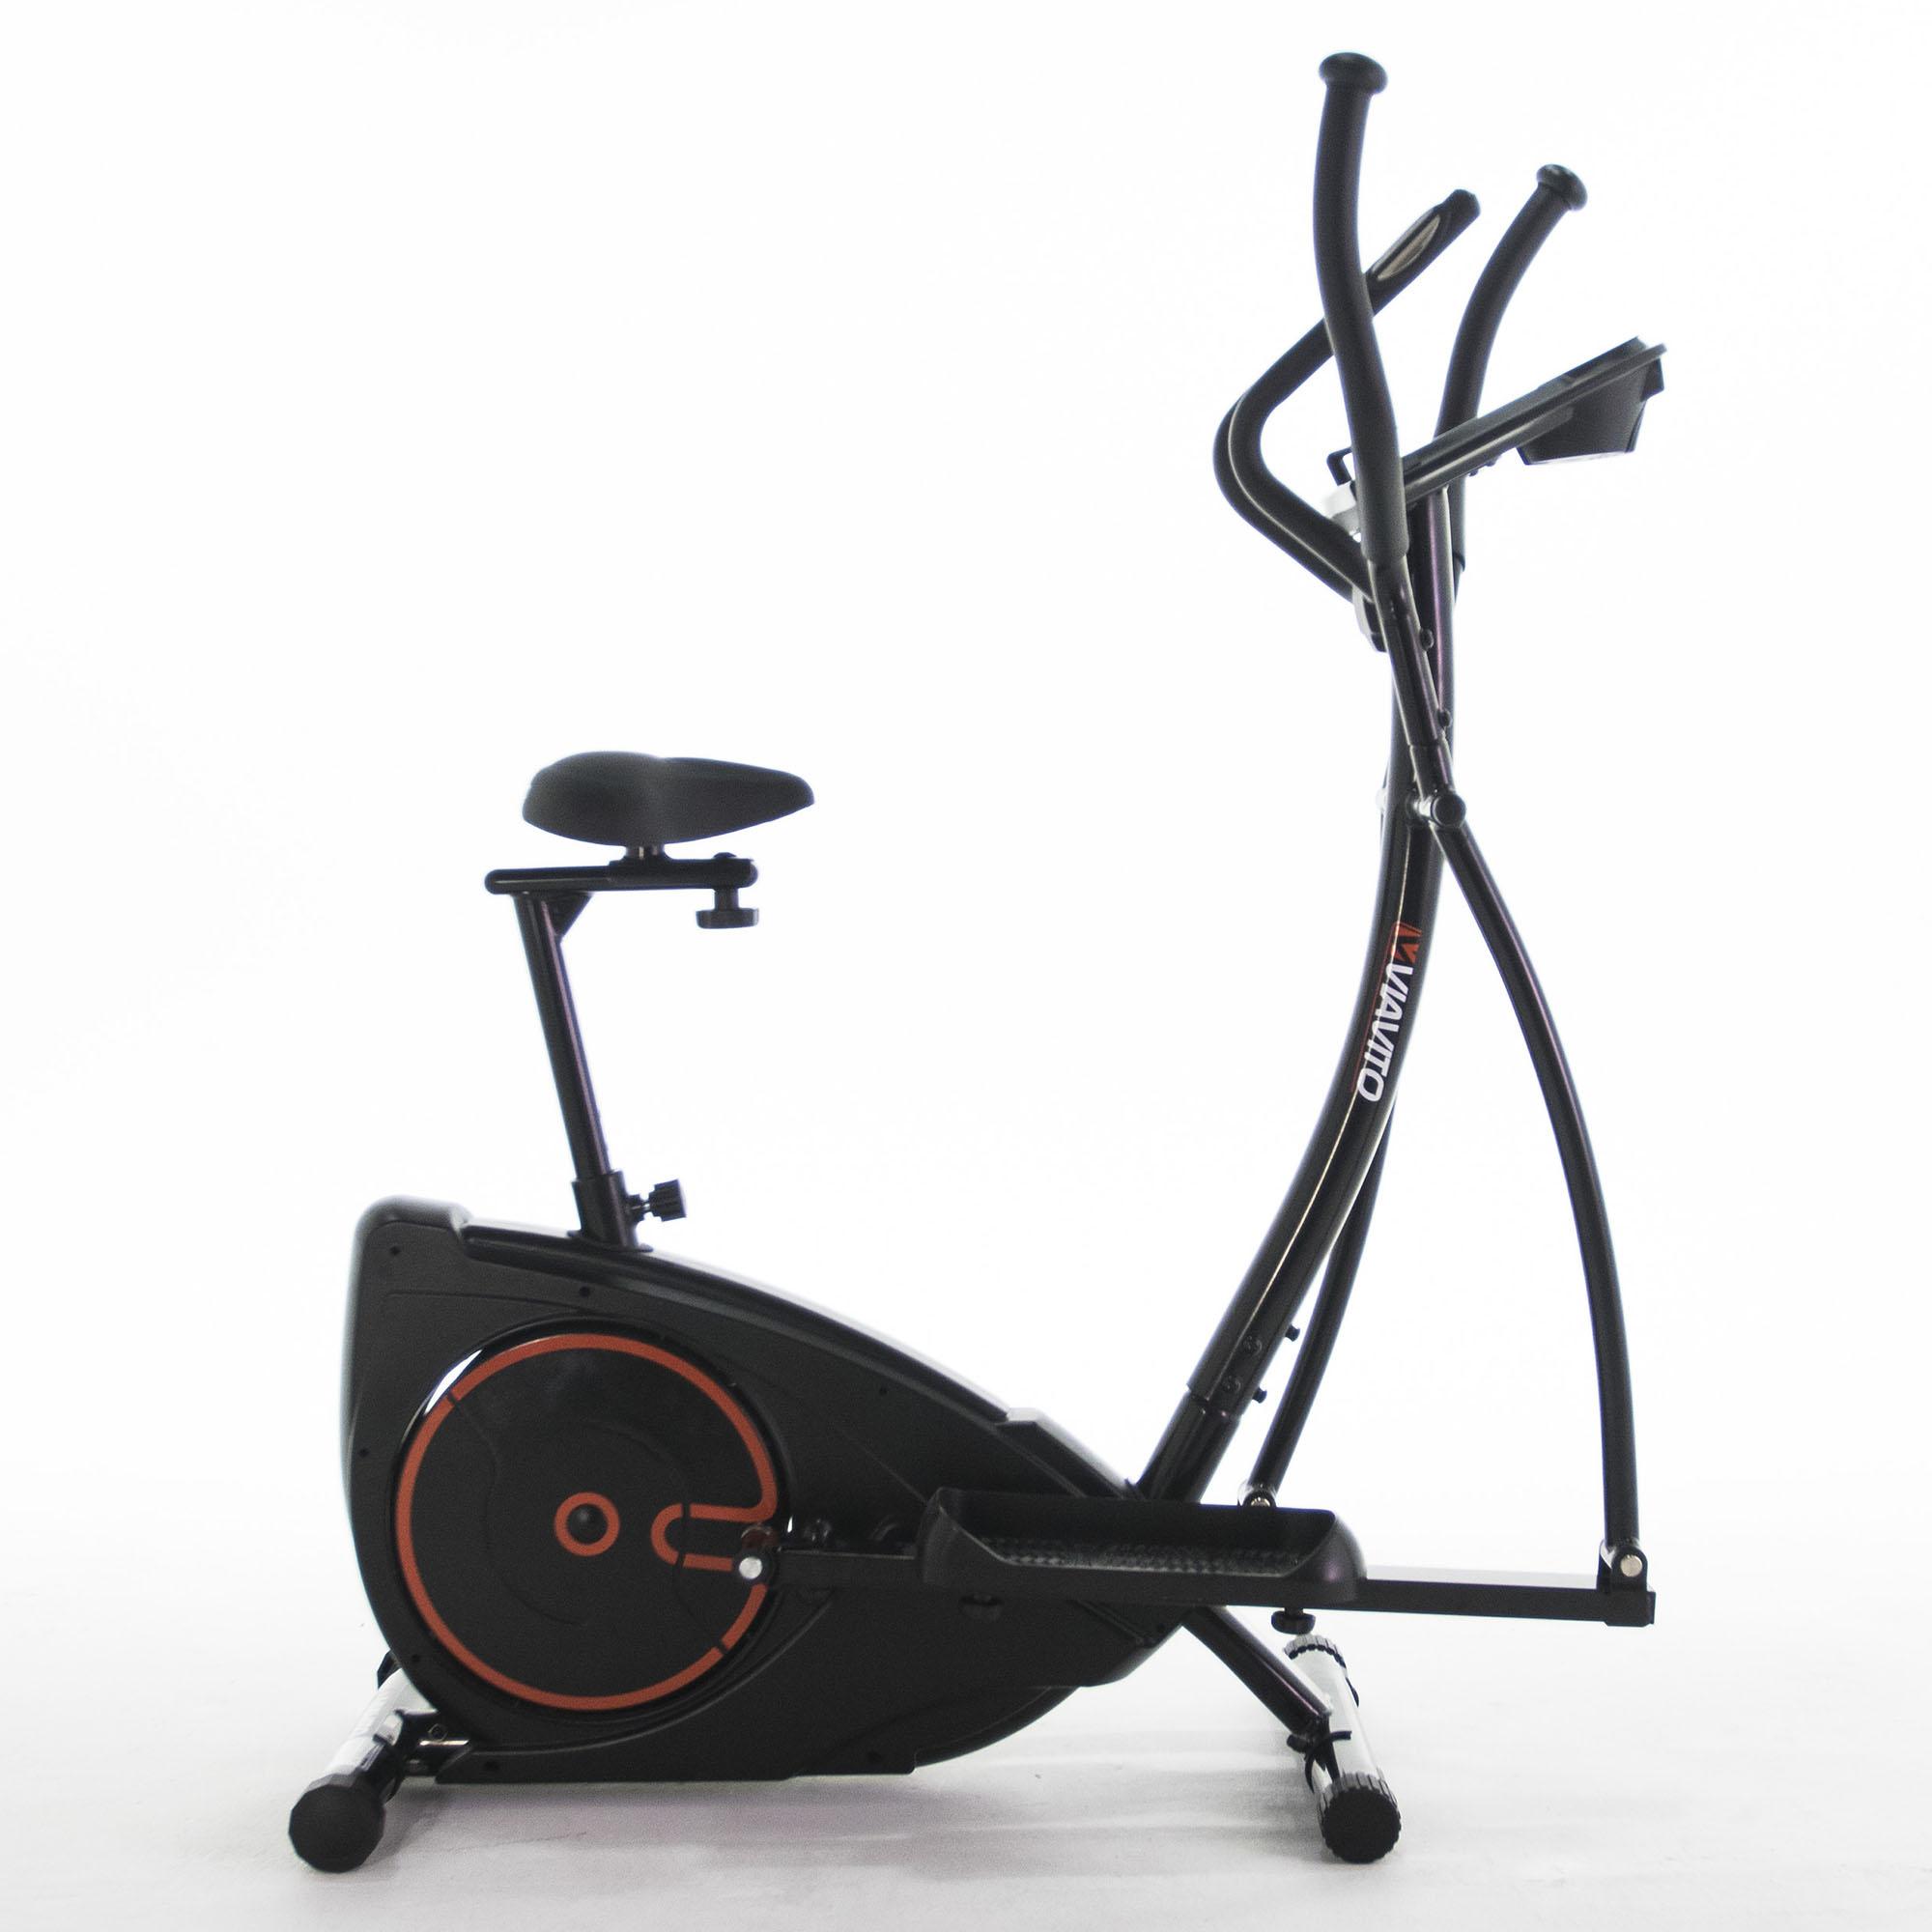 Lifemax Elliptical Bike: V-Fit MCCT1 Magnetic 2 In 1 Cycle Elliptical Trainer